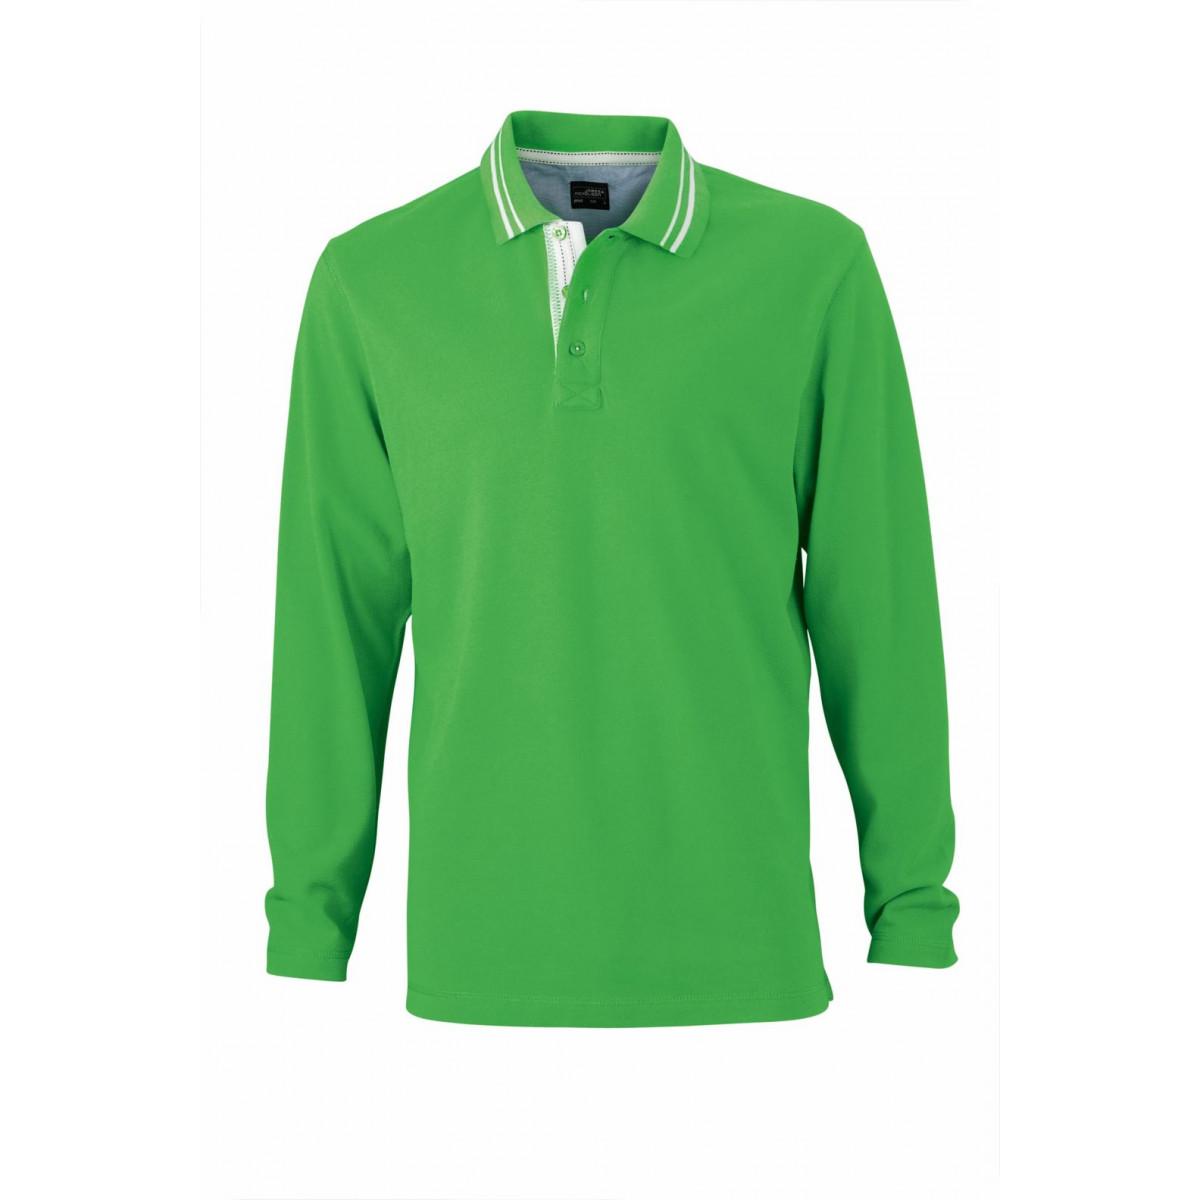 Рубашка поло мужская JN968 Mens Polo Long-Sleeved - Насыщенный зеленый/Белый